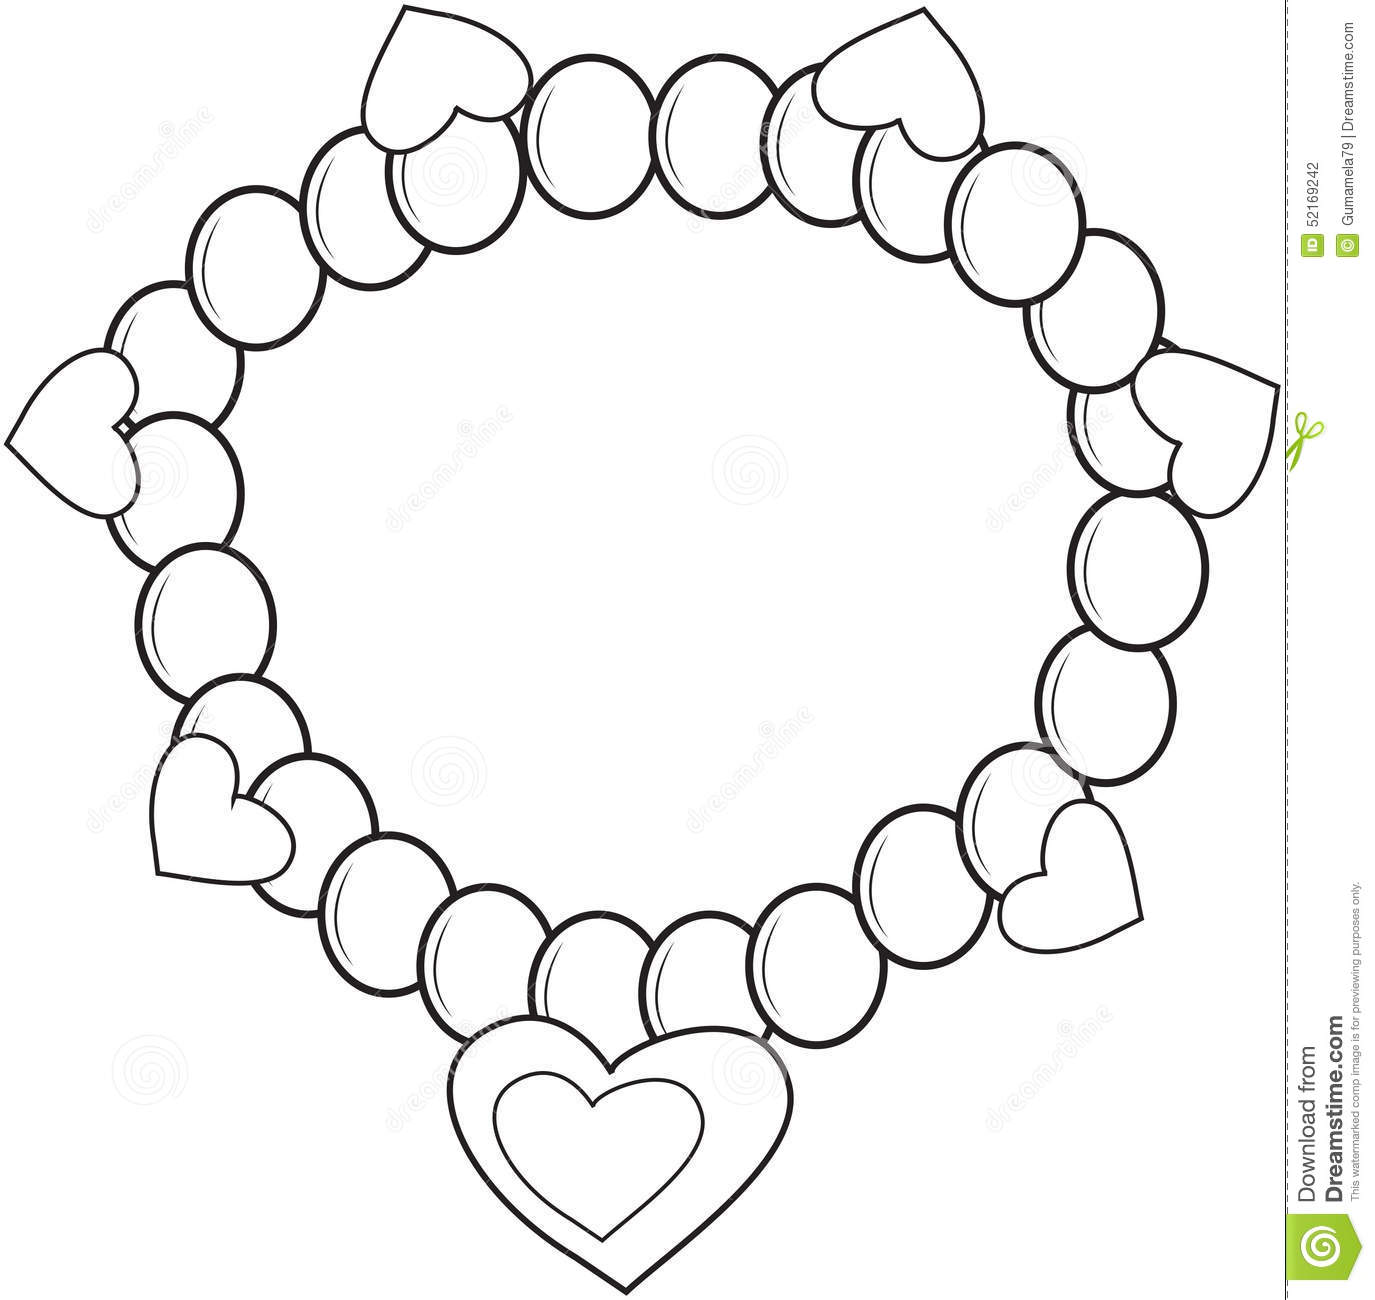 Bracelet coloring #18, Download drawings